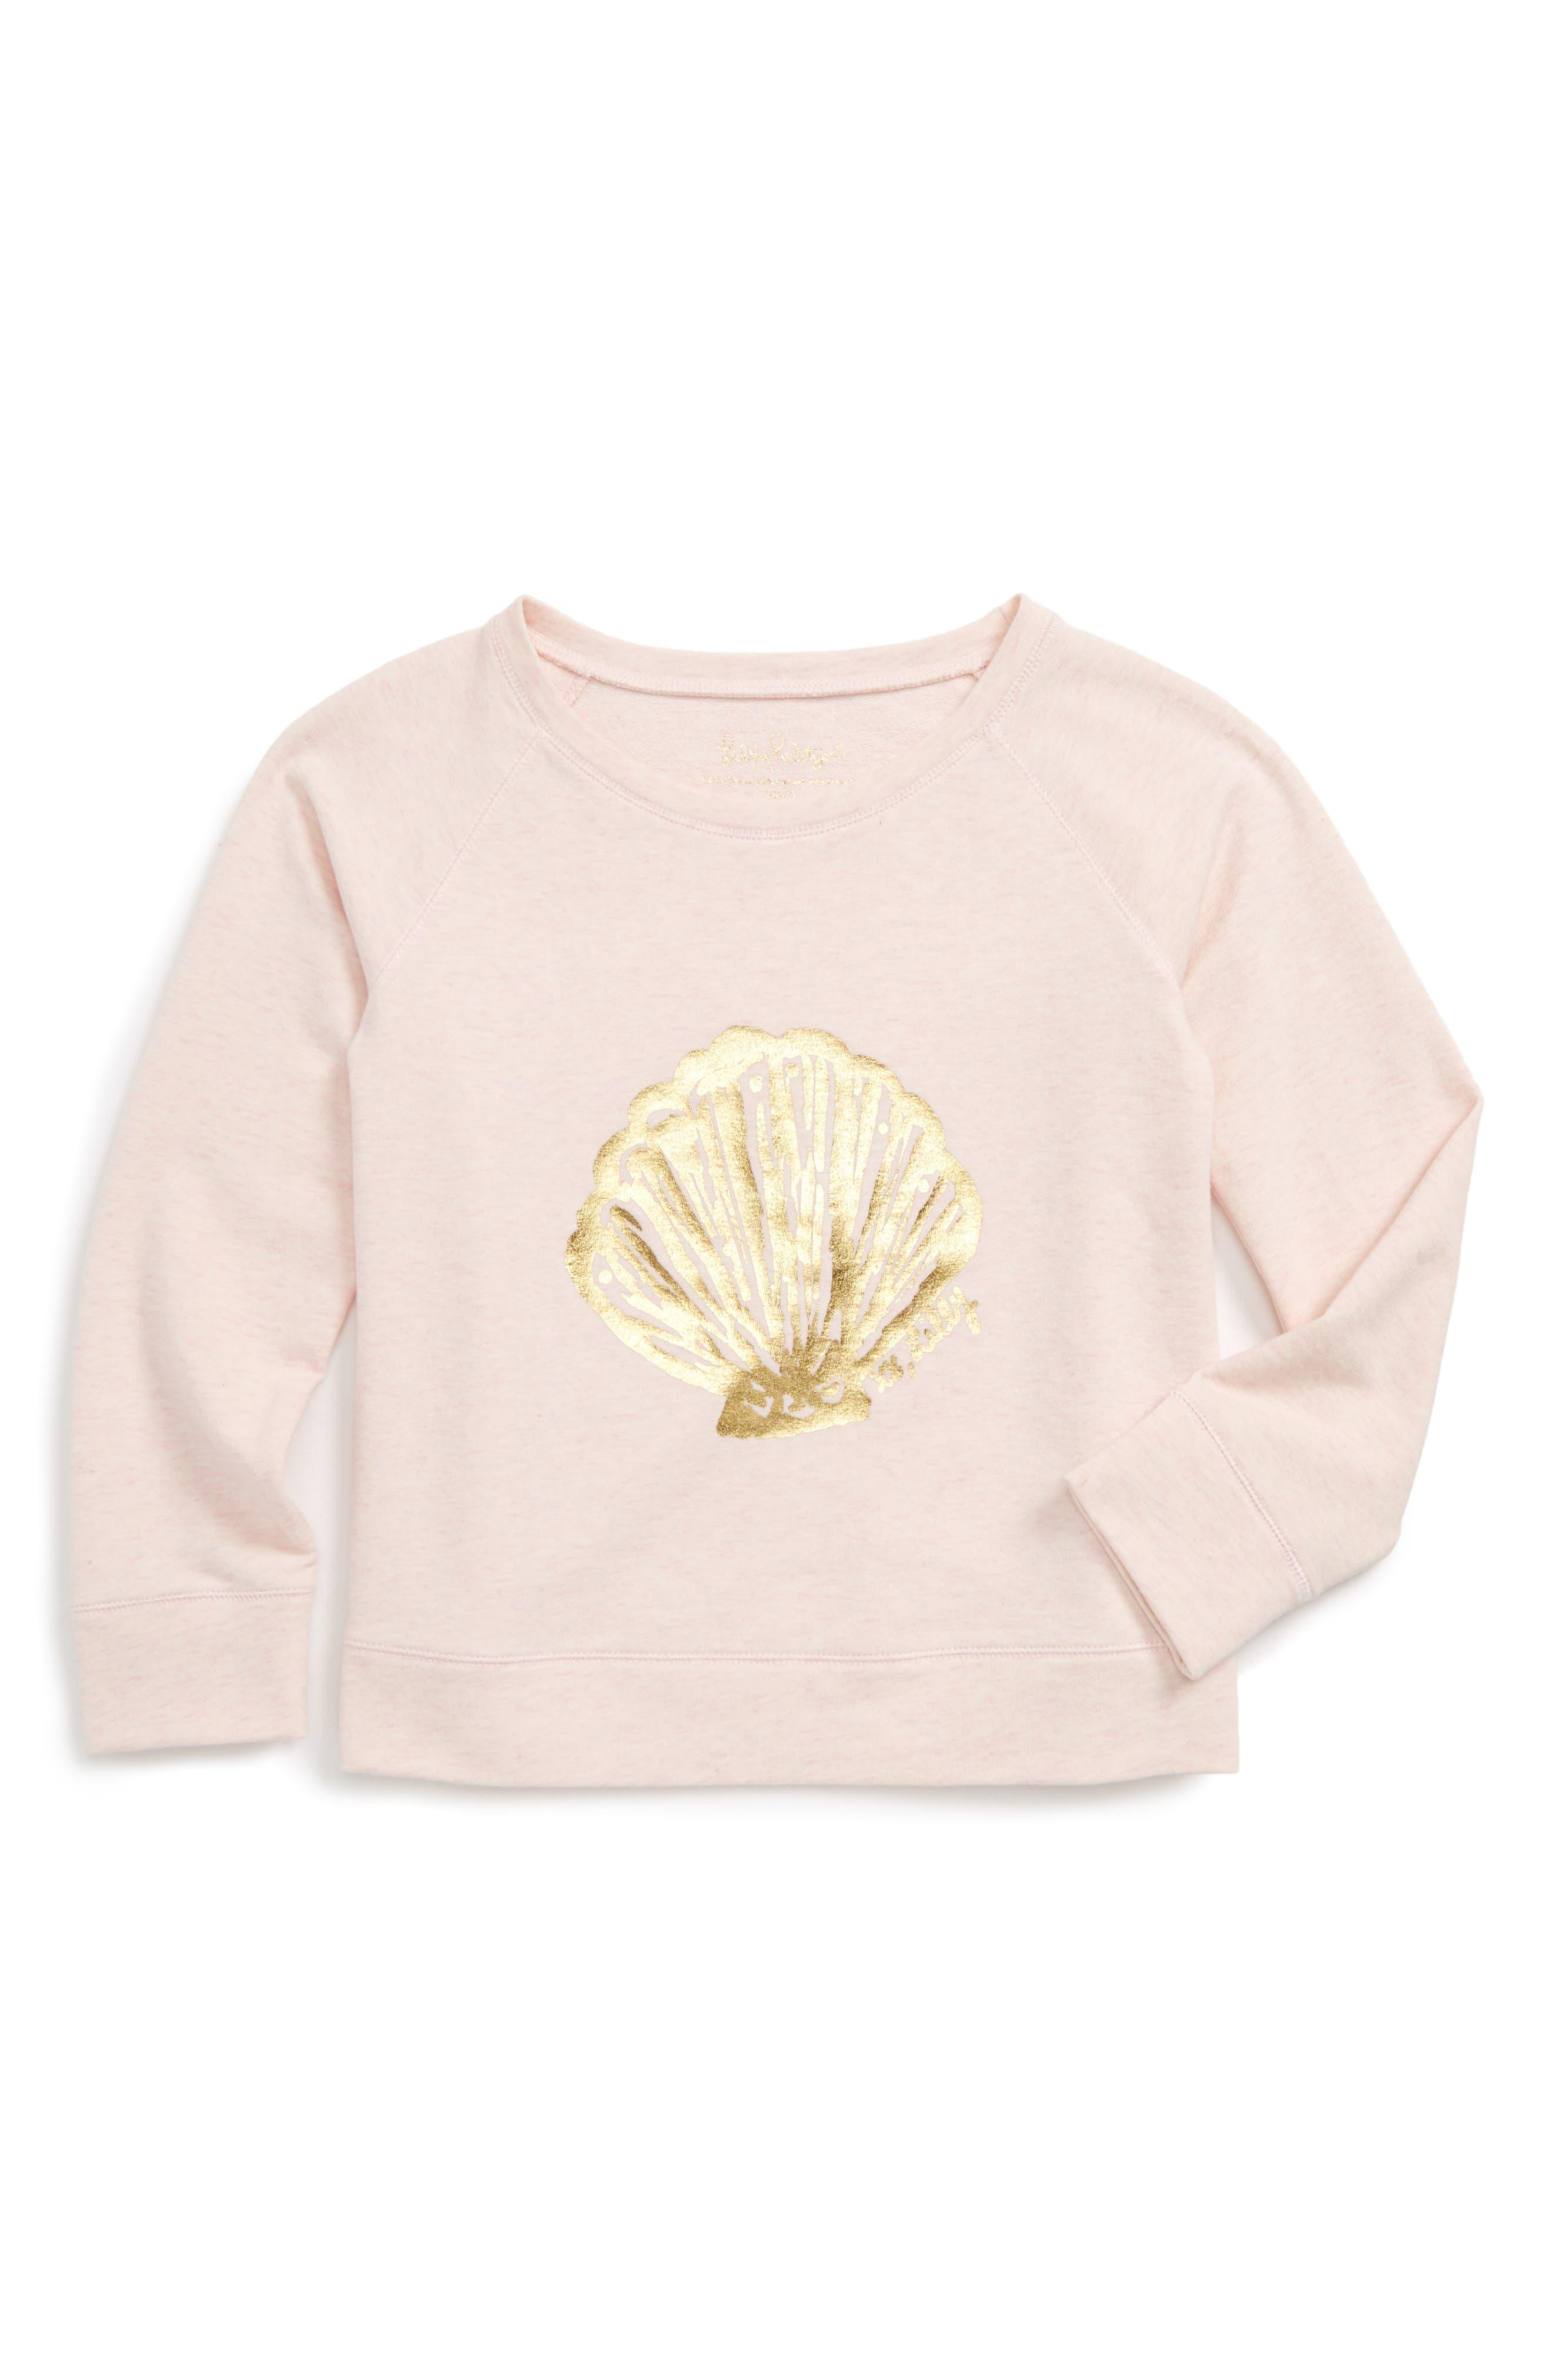 Lilly Pulitzer Shara Graphic Print Sweatshirt,                         Main,                         color, 689